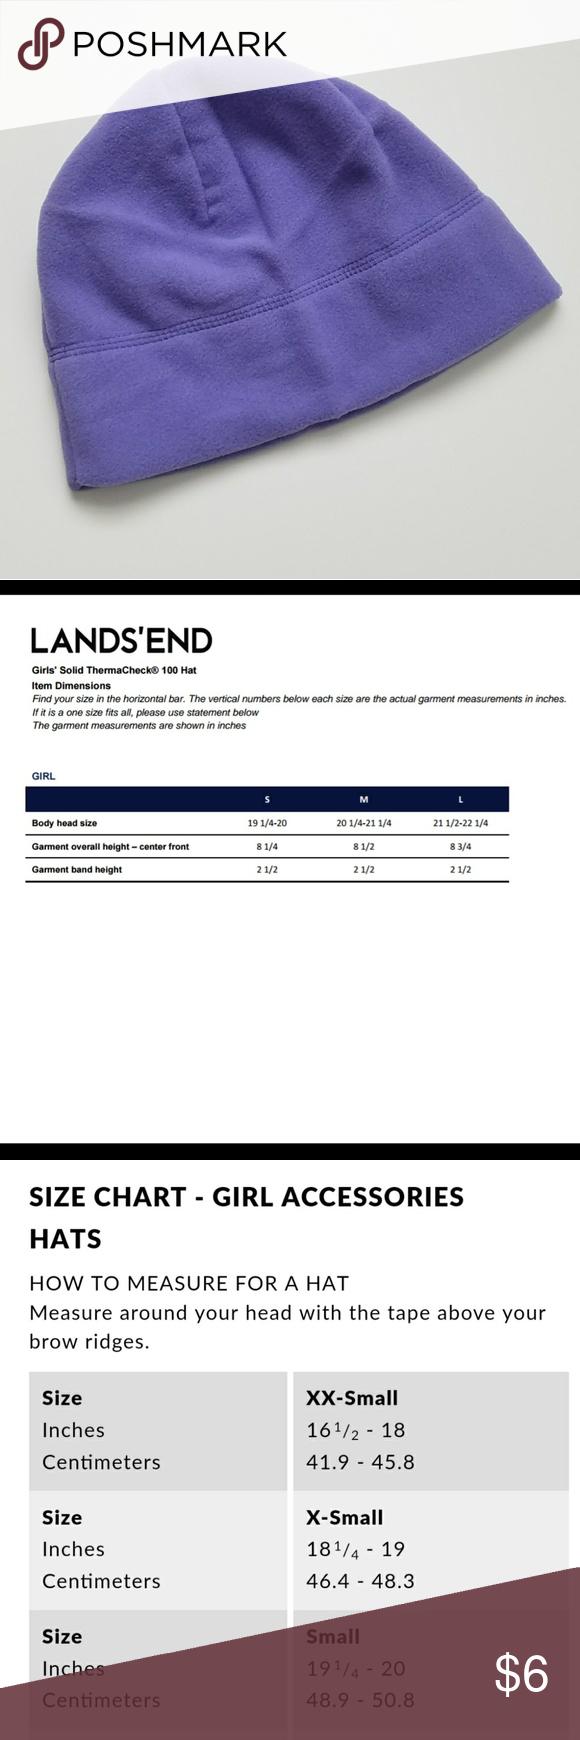 landsend size chart